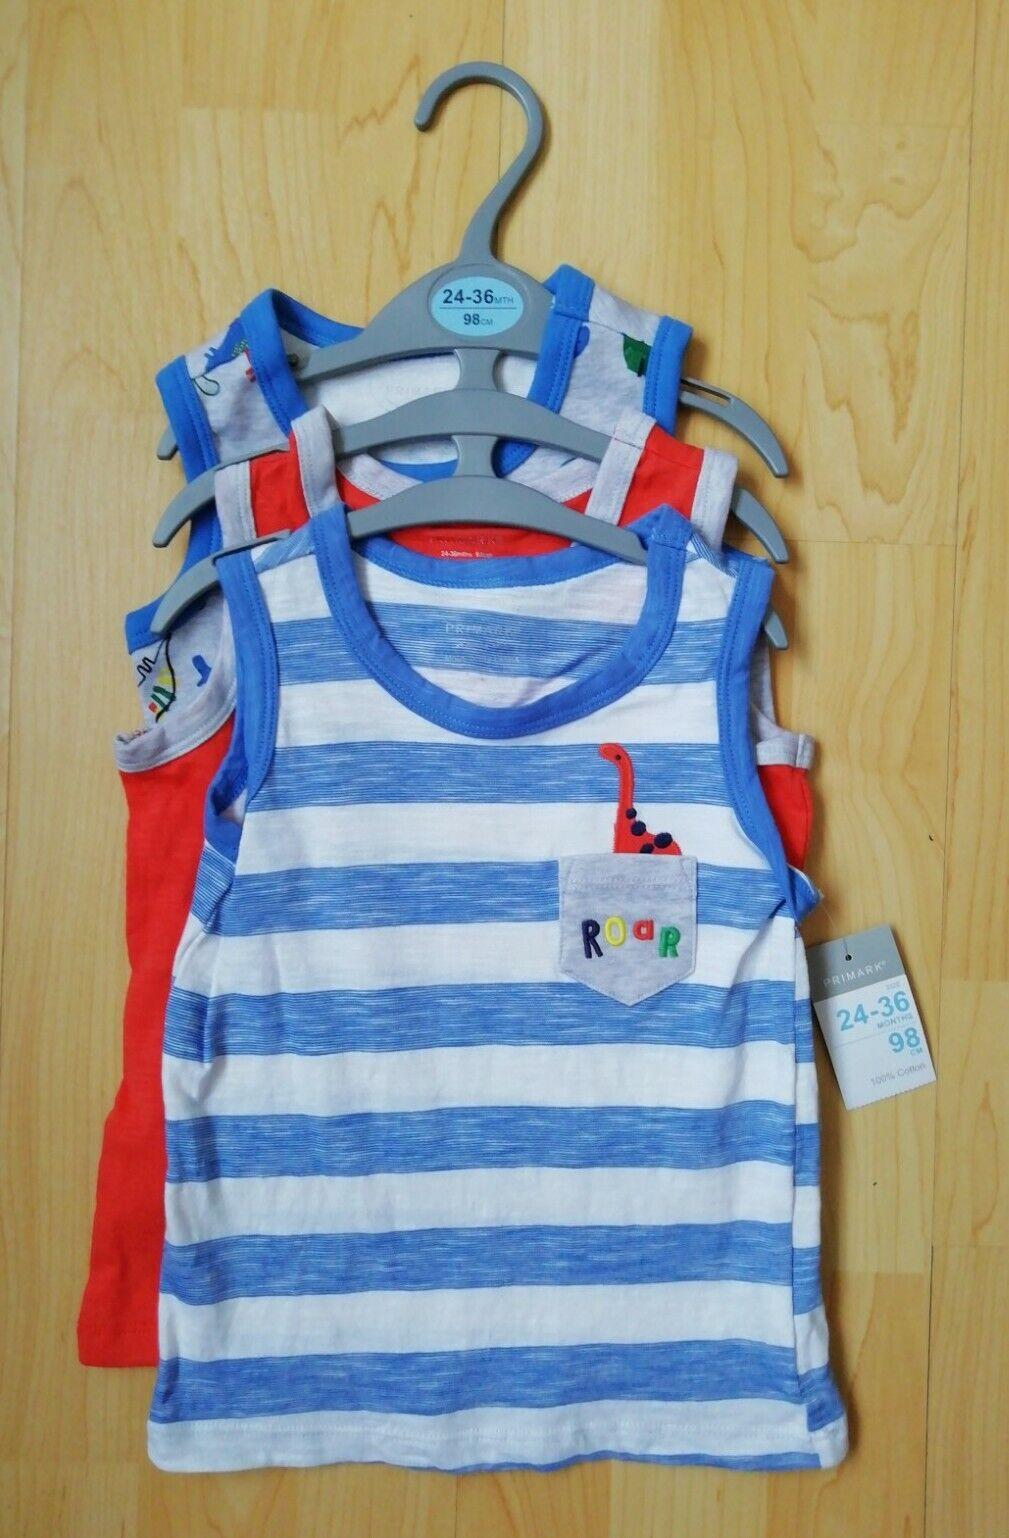 3 x Dinasaur themed Boys Vest Tops Age 24-36 months (bnwt)